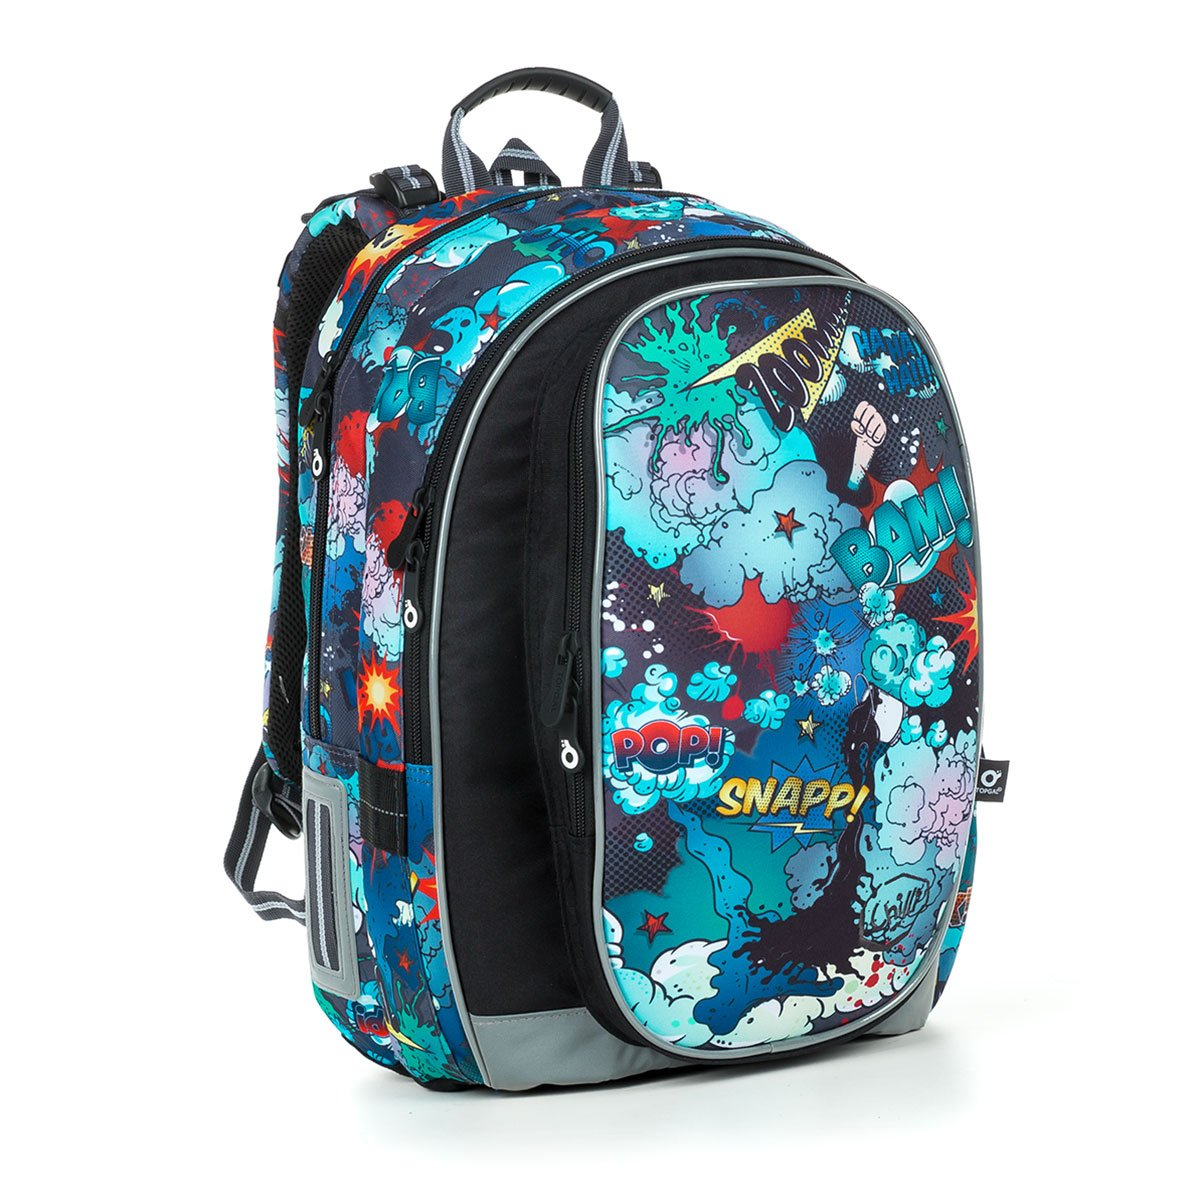 Školní batoh Topgal MIRA 19019 B 0053441324